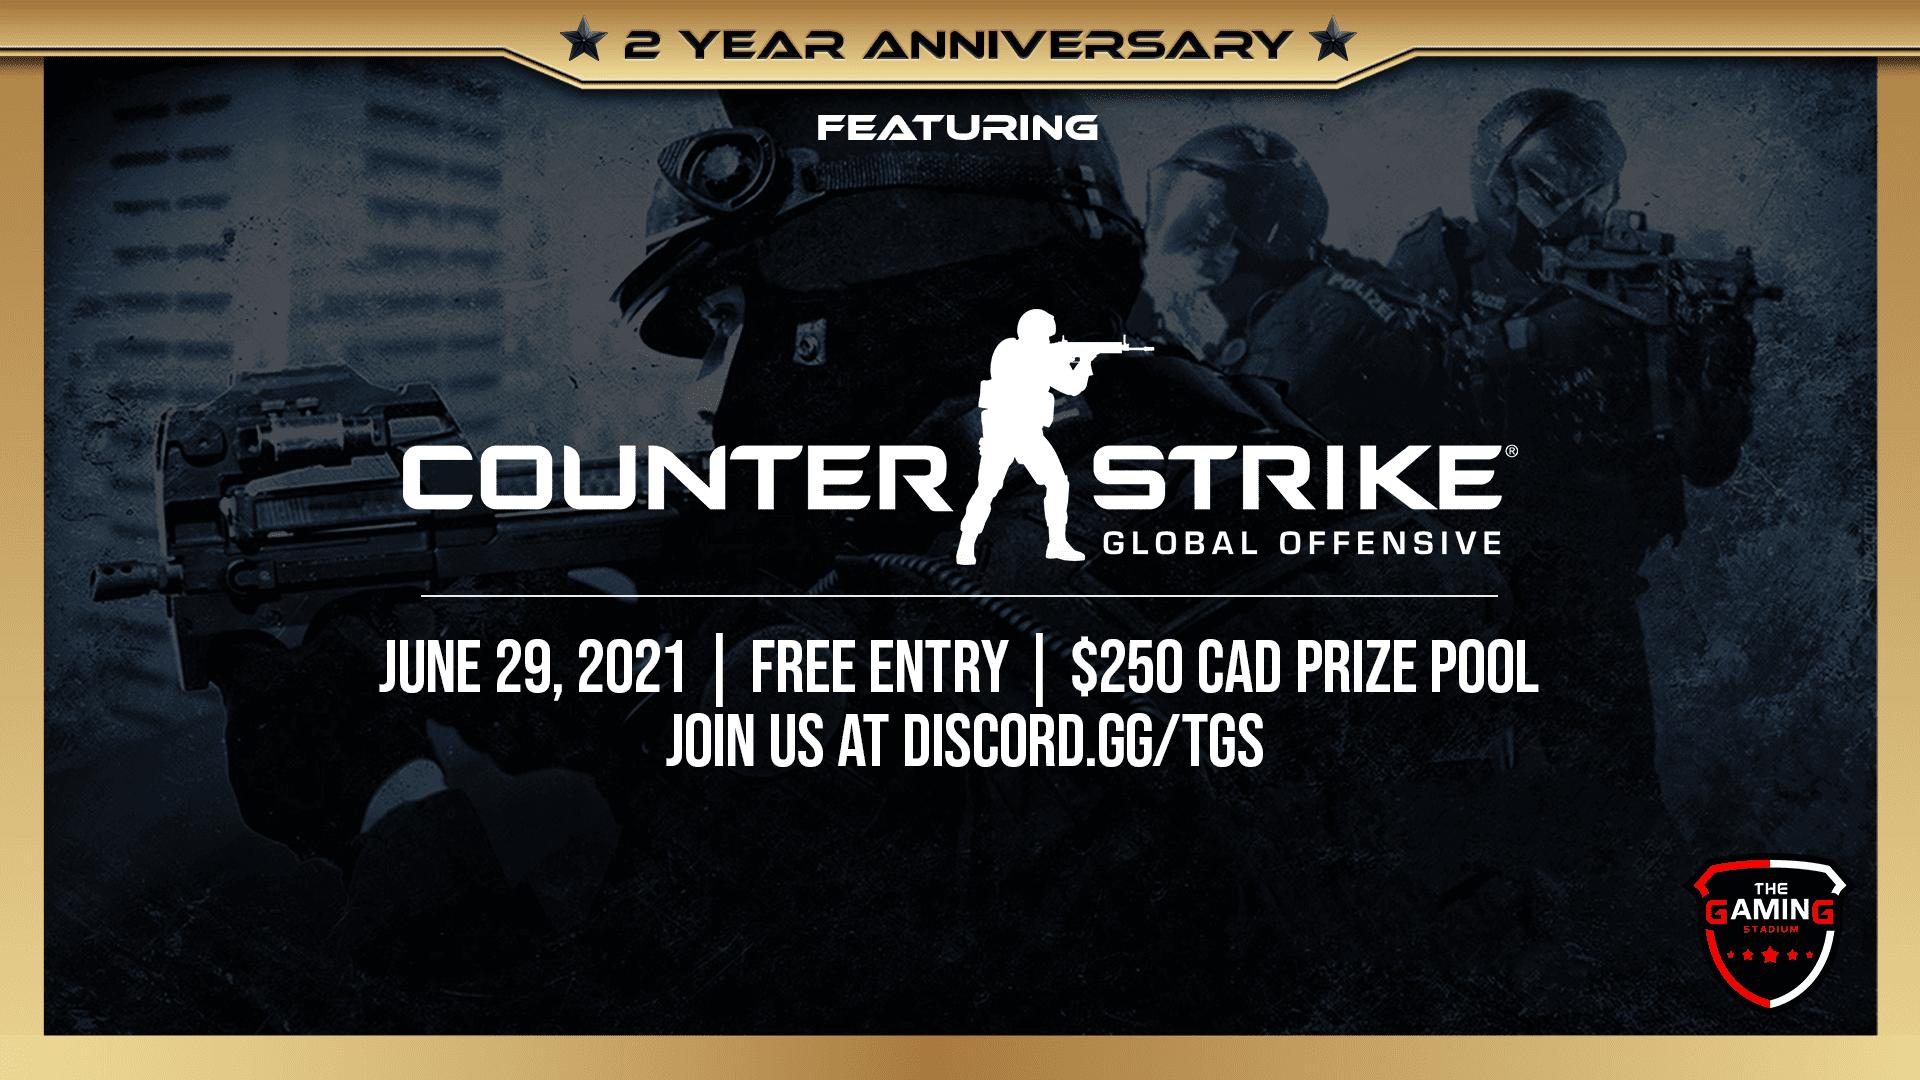 counterstrike event details